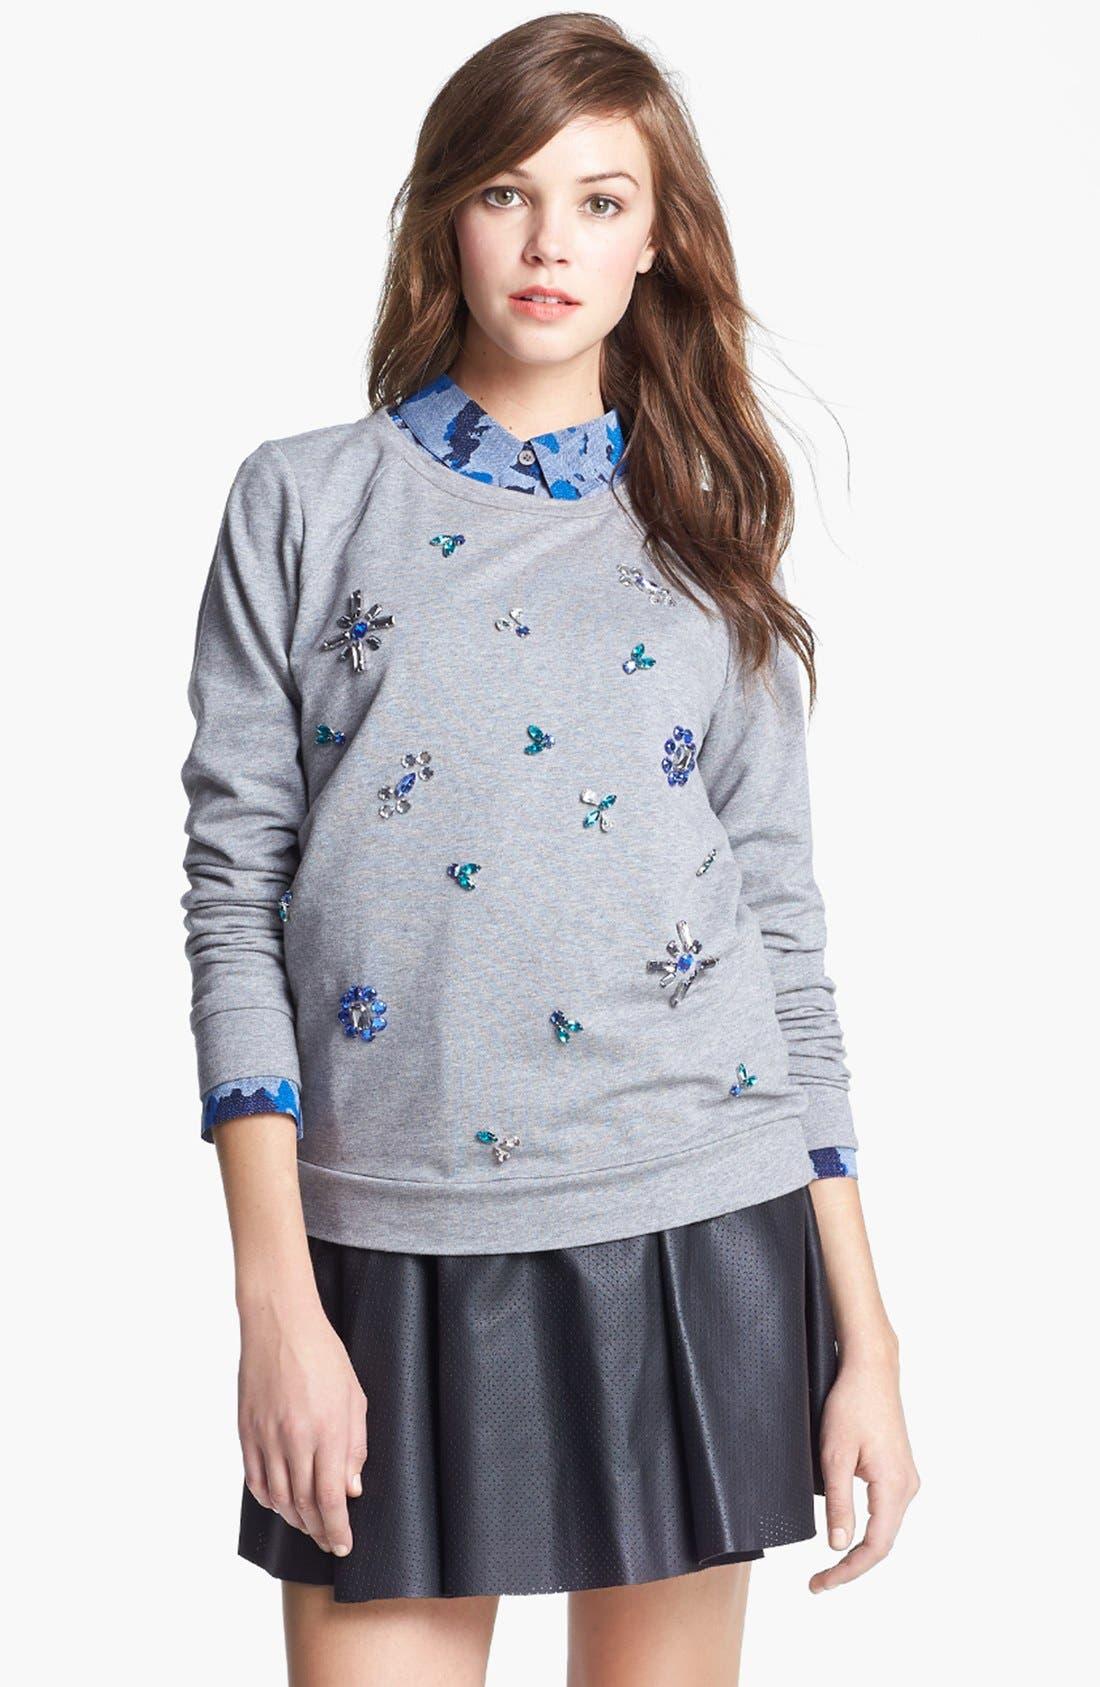 Alternate Image 1 Selected - Two by Vince Camuto Jeweled Baseball Sweatshirt (Petite)